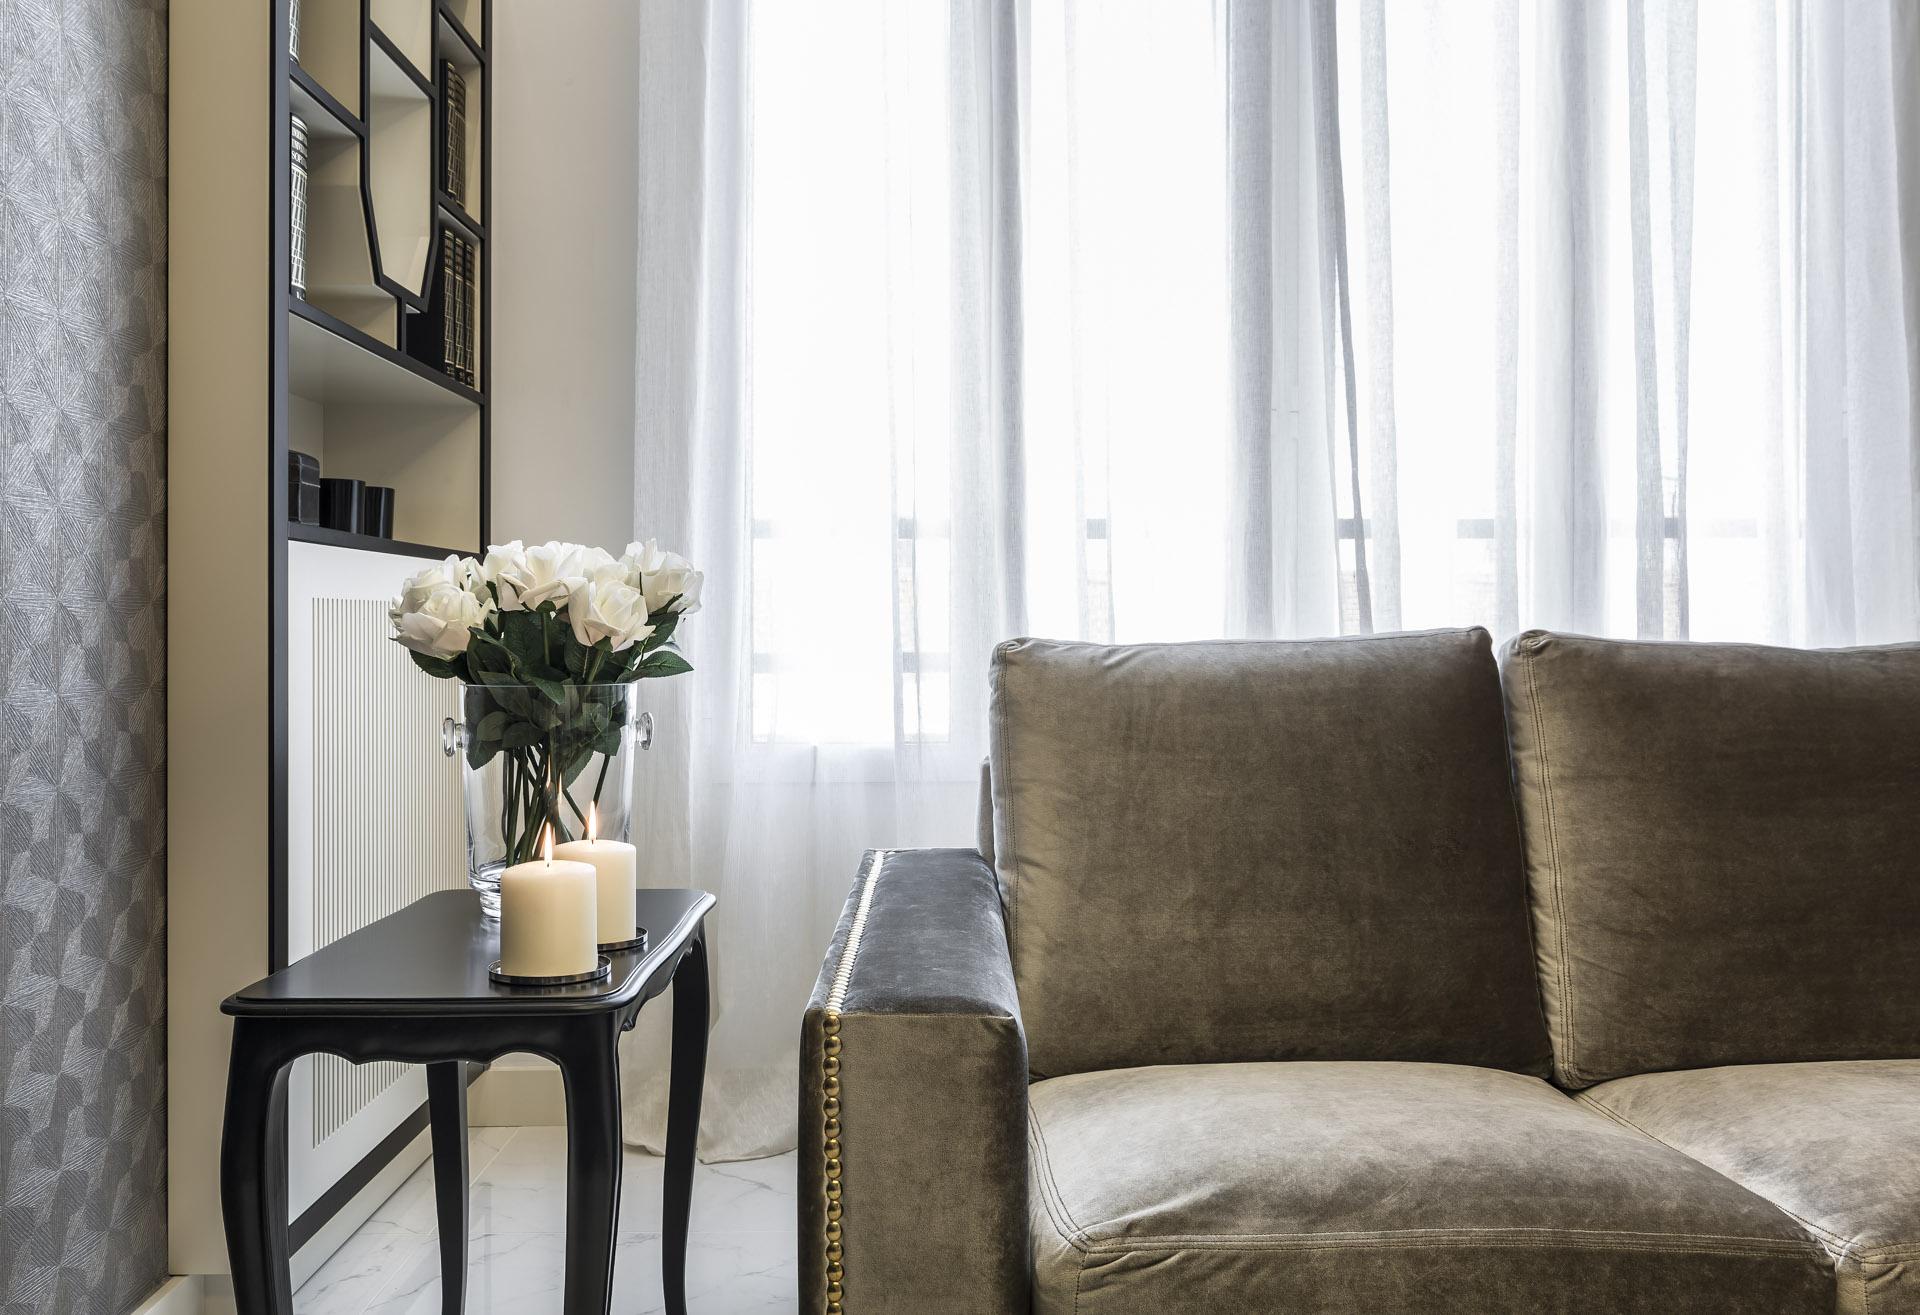 fotografia-arquitectura-valencia-interiorismo-german-cabo-laura-yerpes-apartamento-05